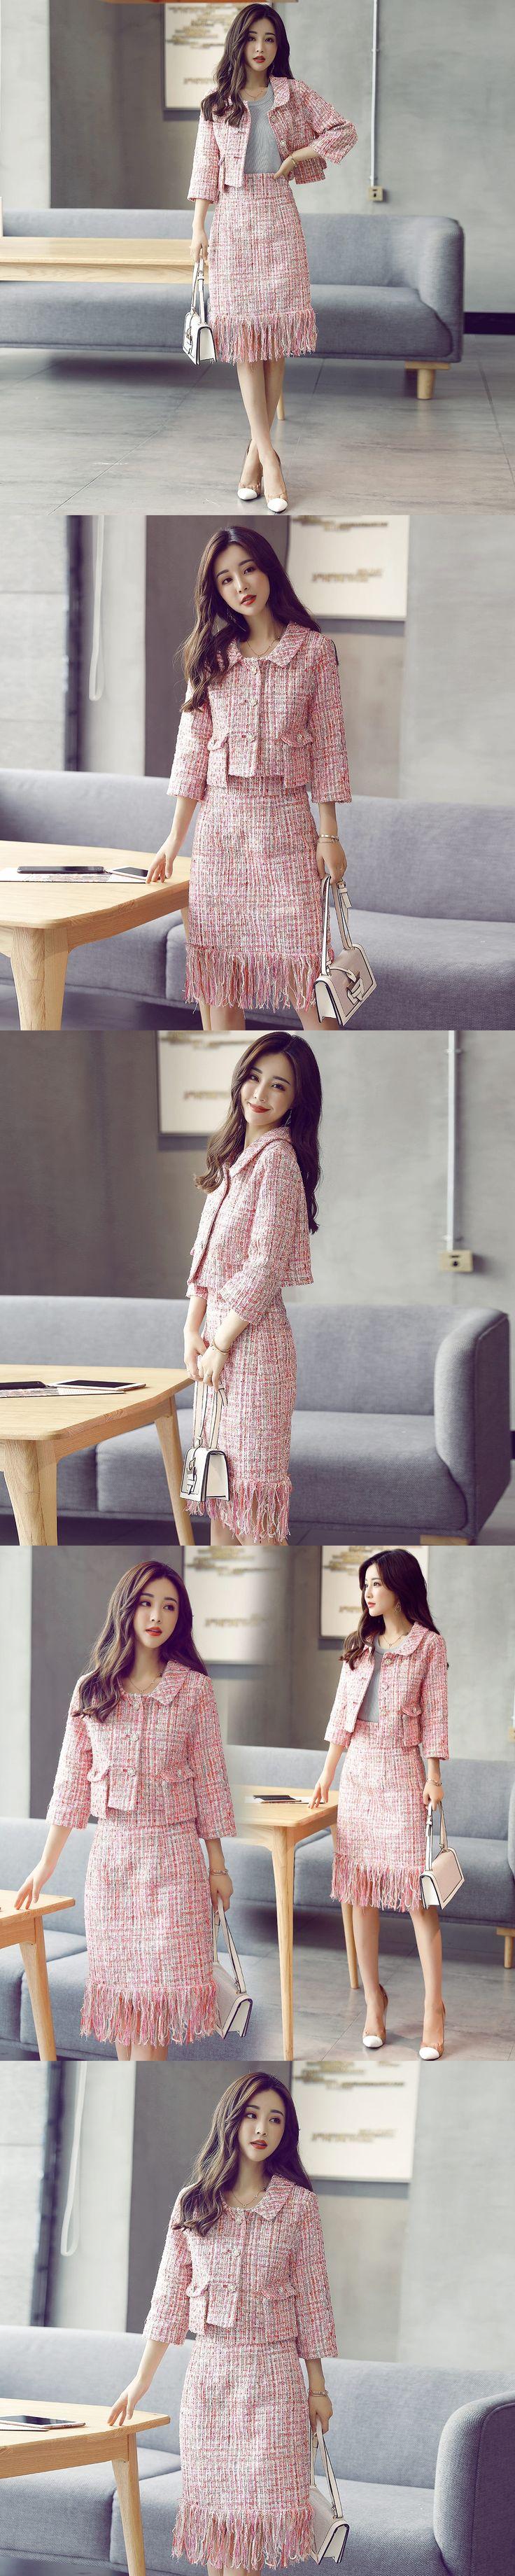 Wool suit female 2017 new autumn and winter small fragrant pink lattice turn-down collar short jackets coat + tassel skirt